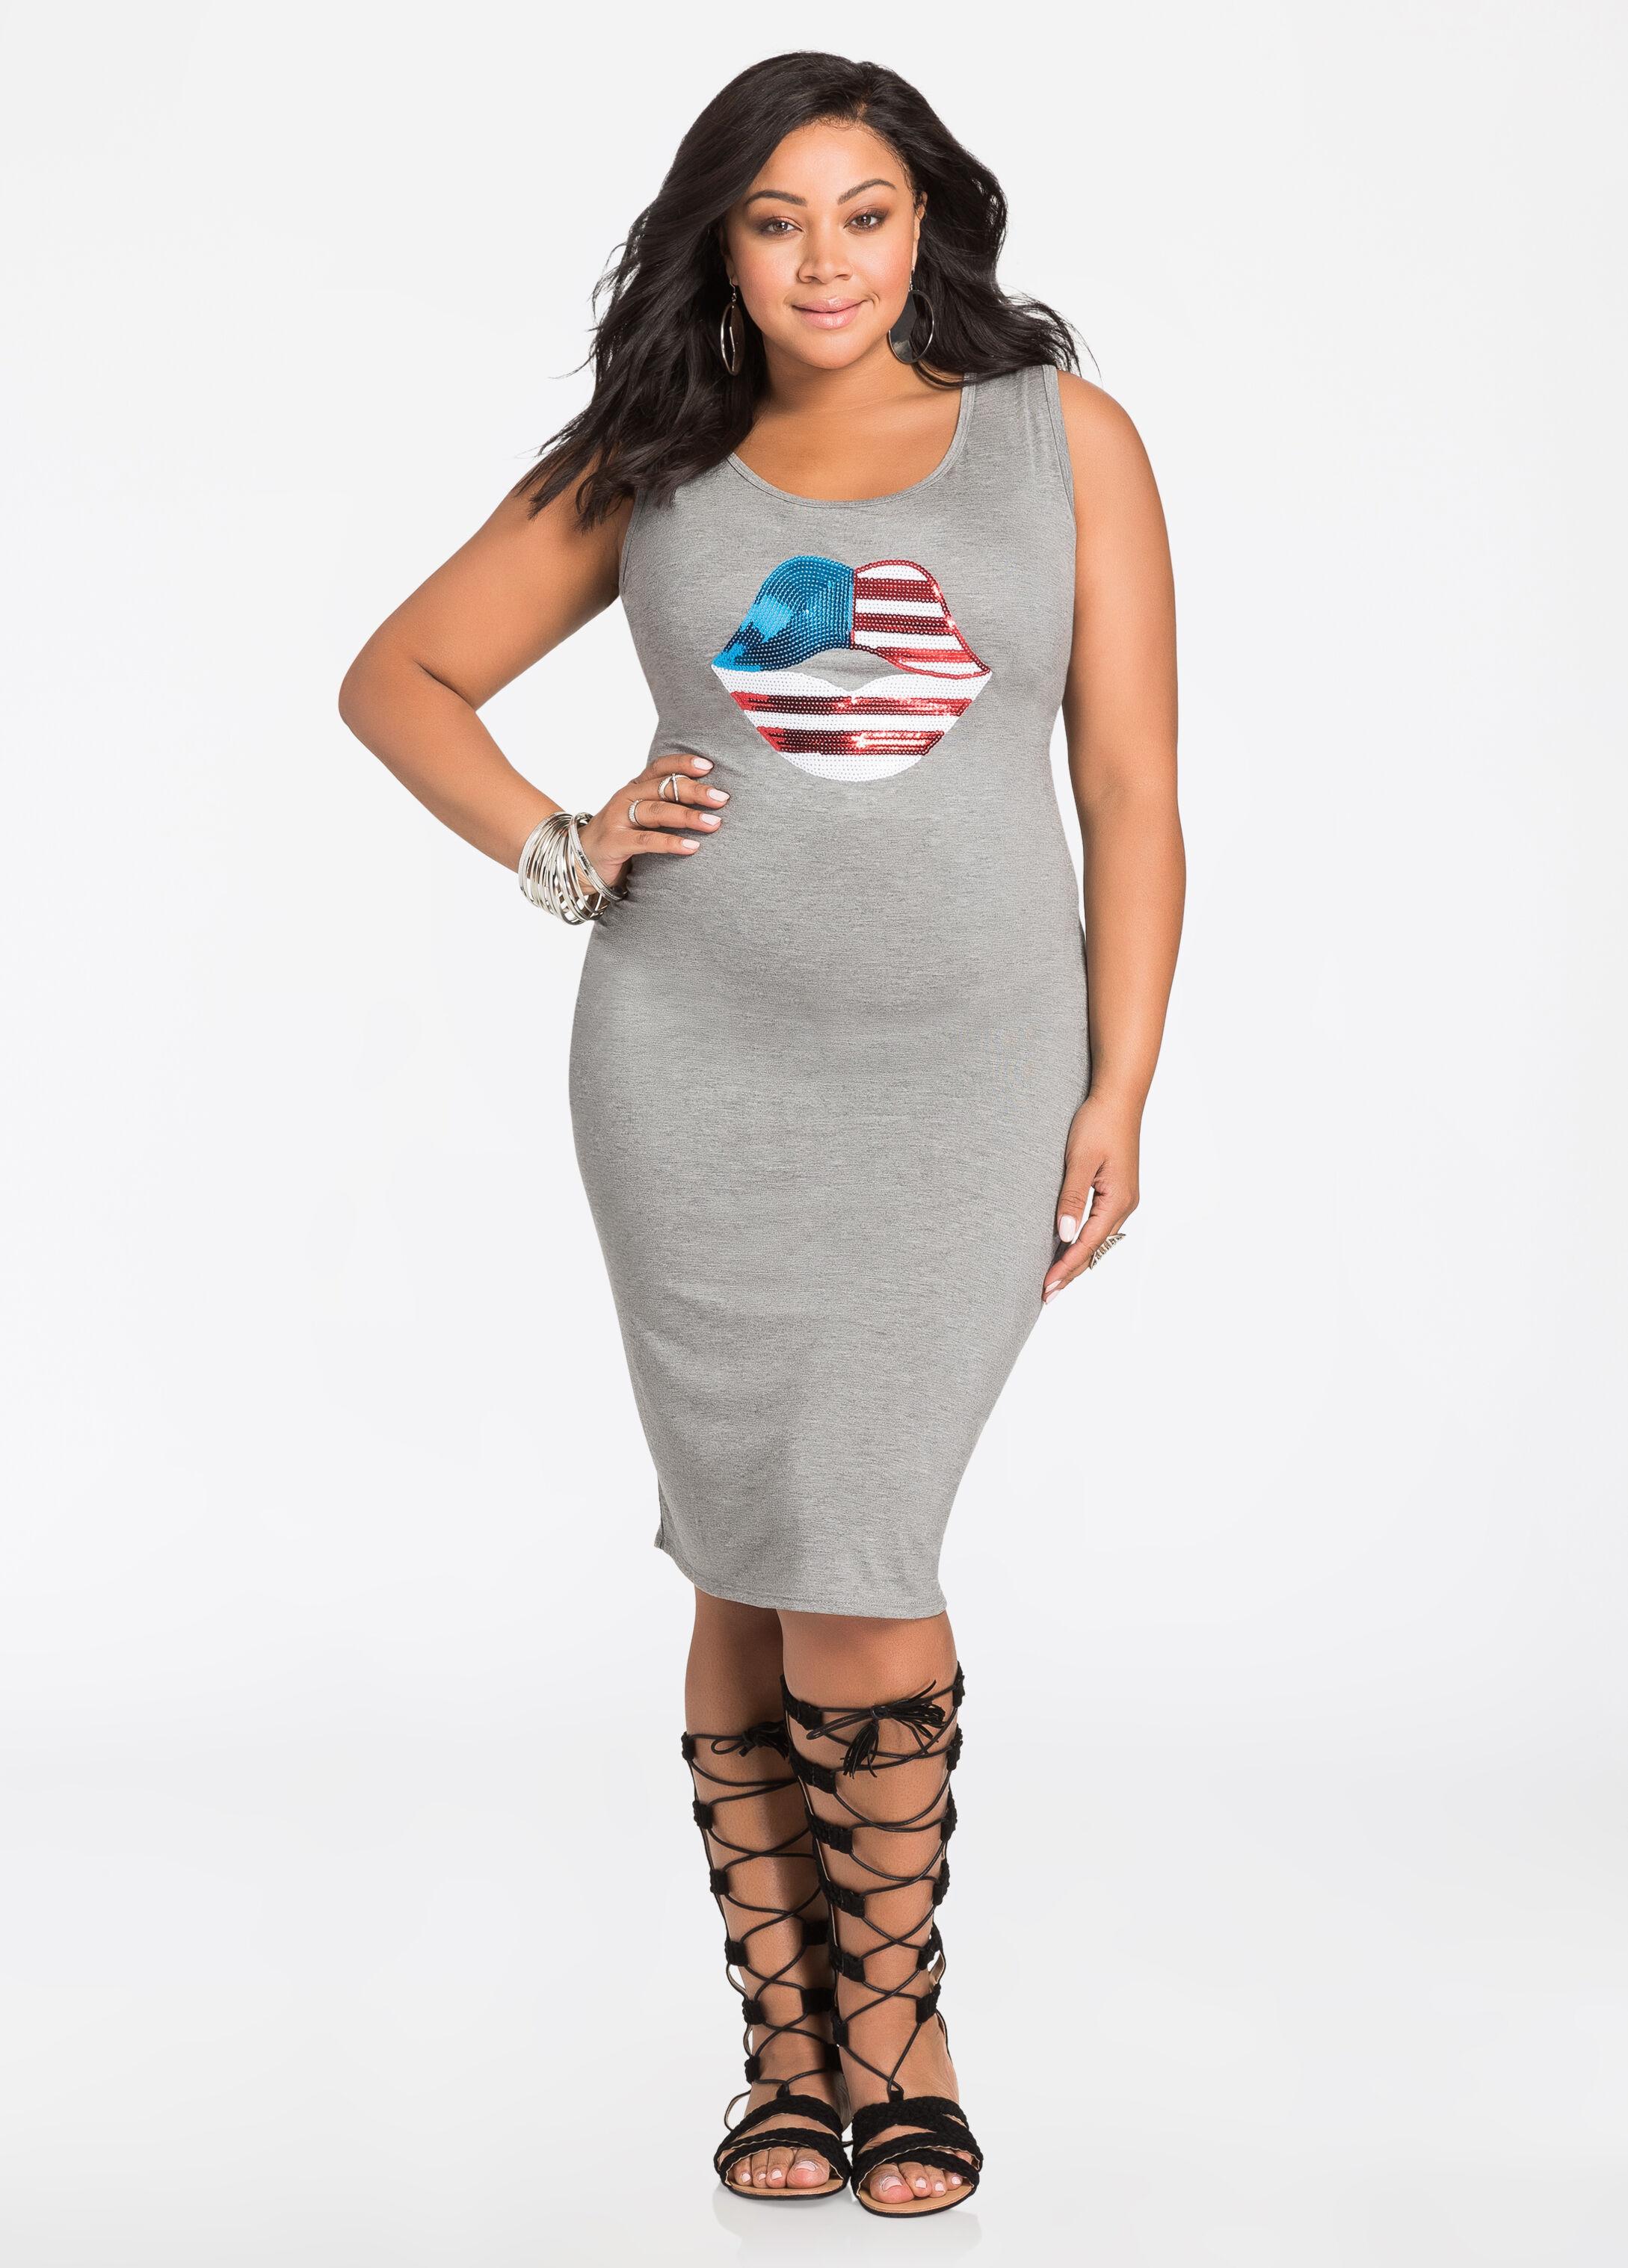 Plus Size Dresses - American Flag Sequin Lips T-Shirt Dress